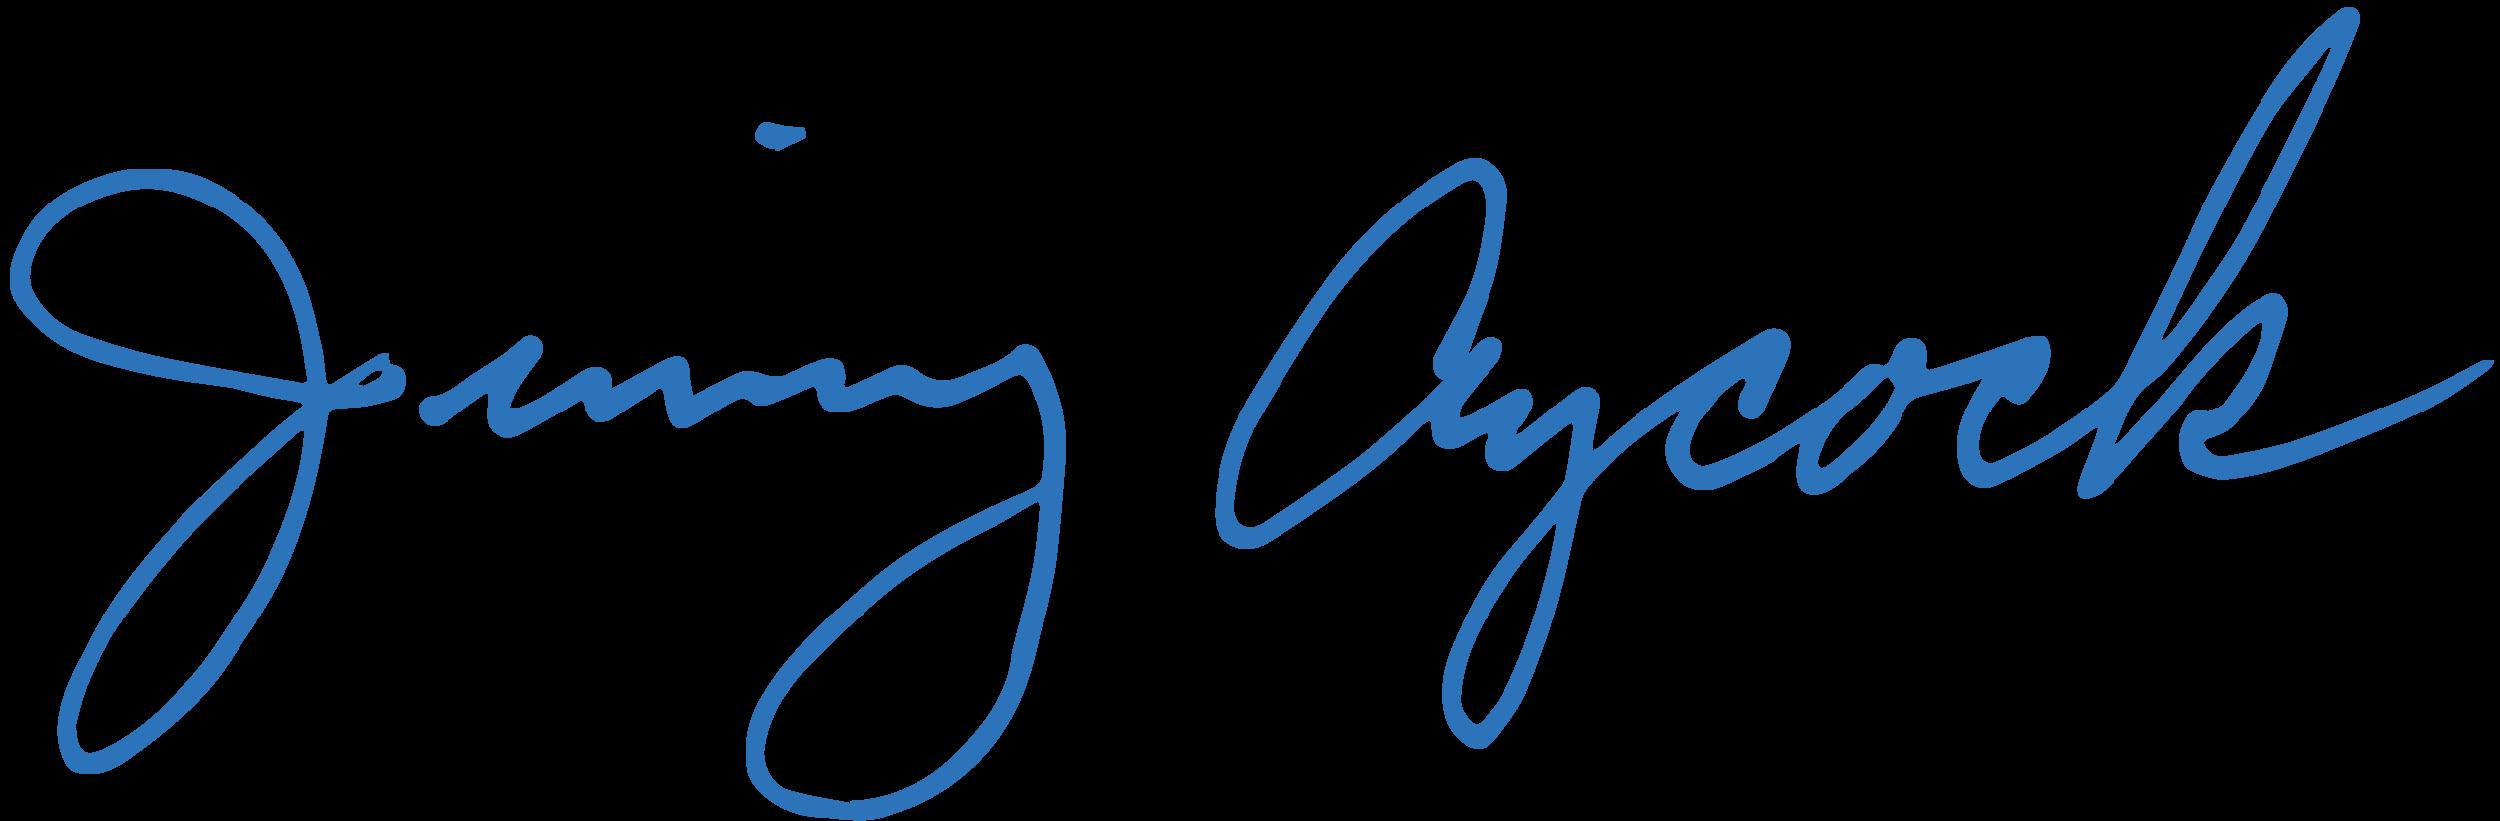 Jimmy Signature ILI Blue-03.png